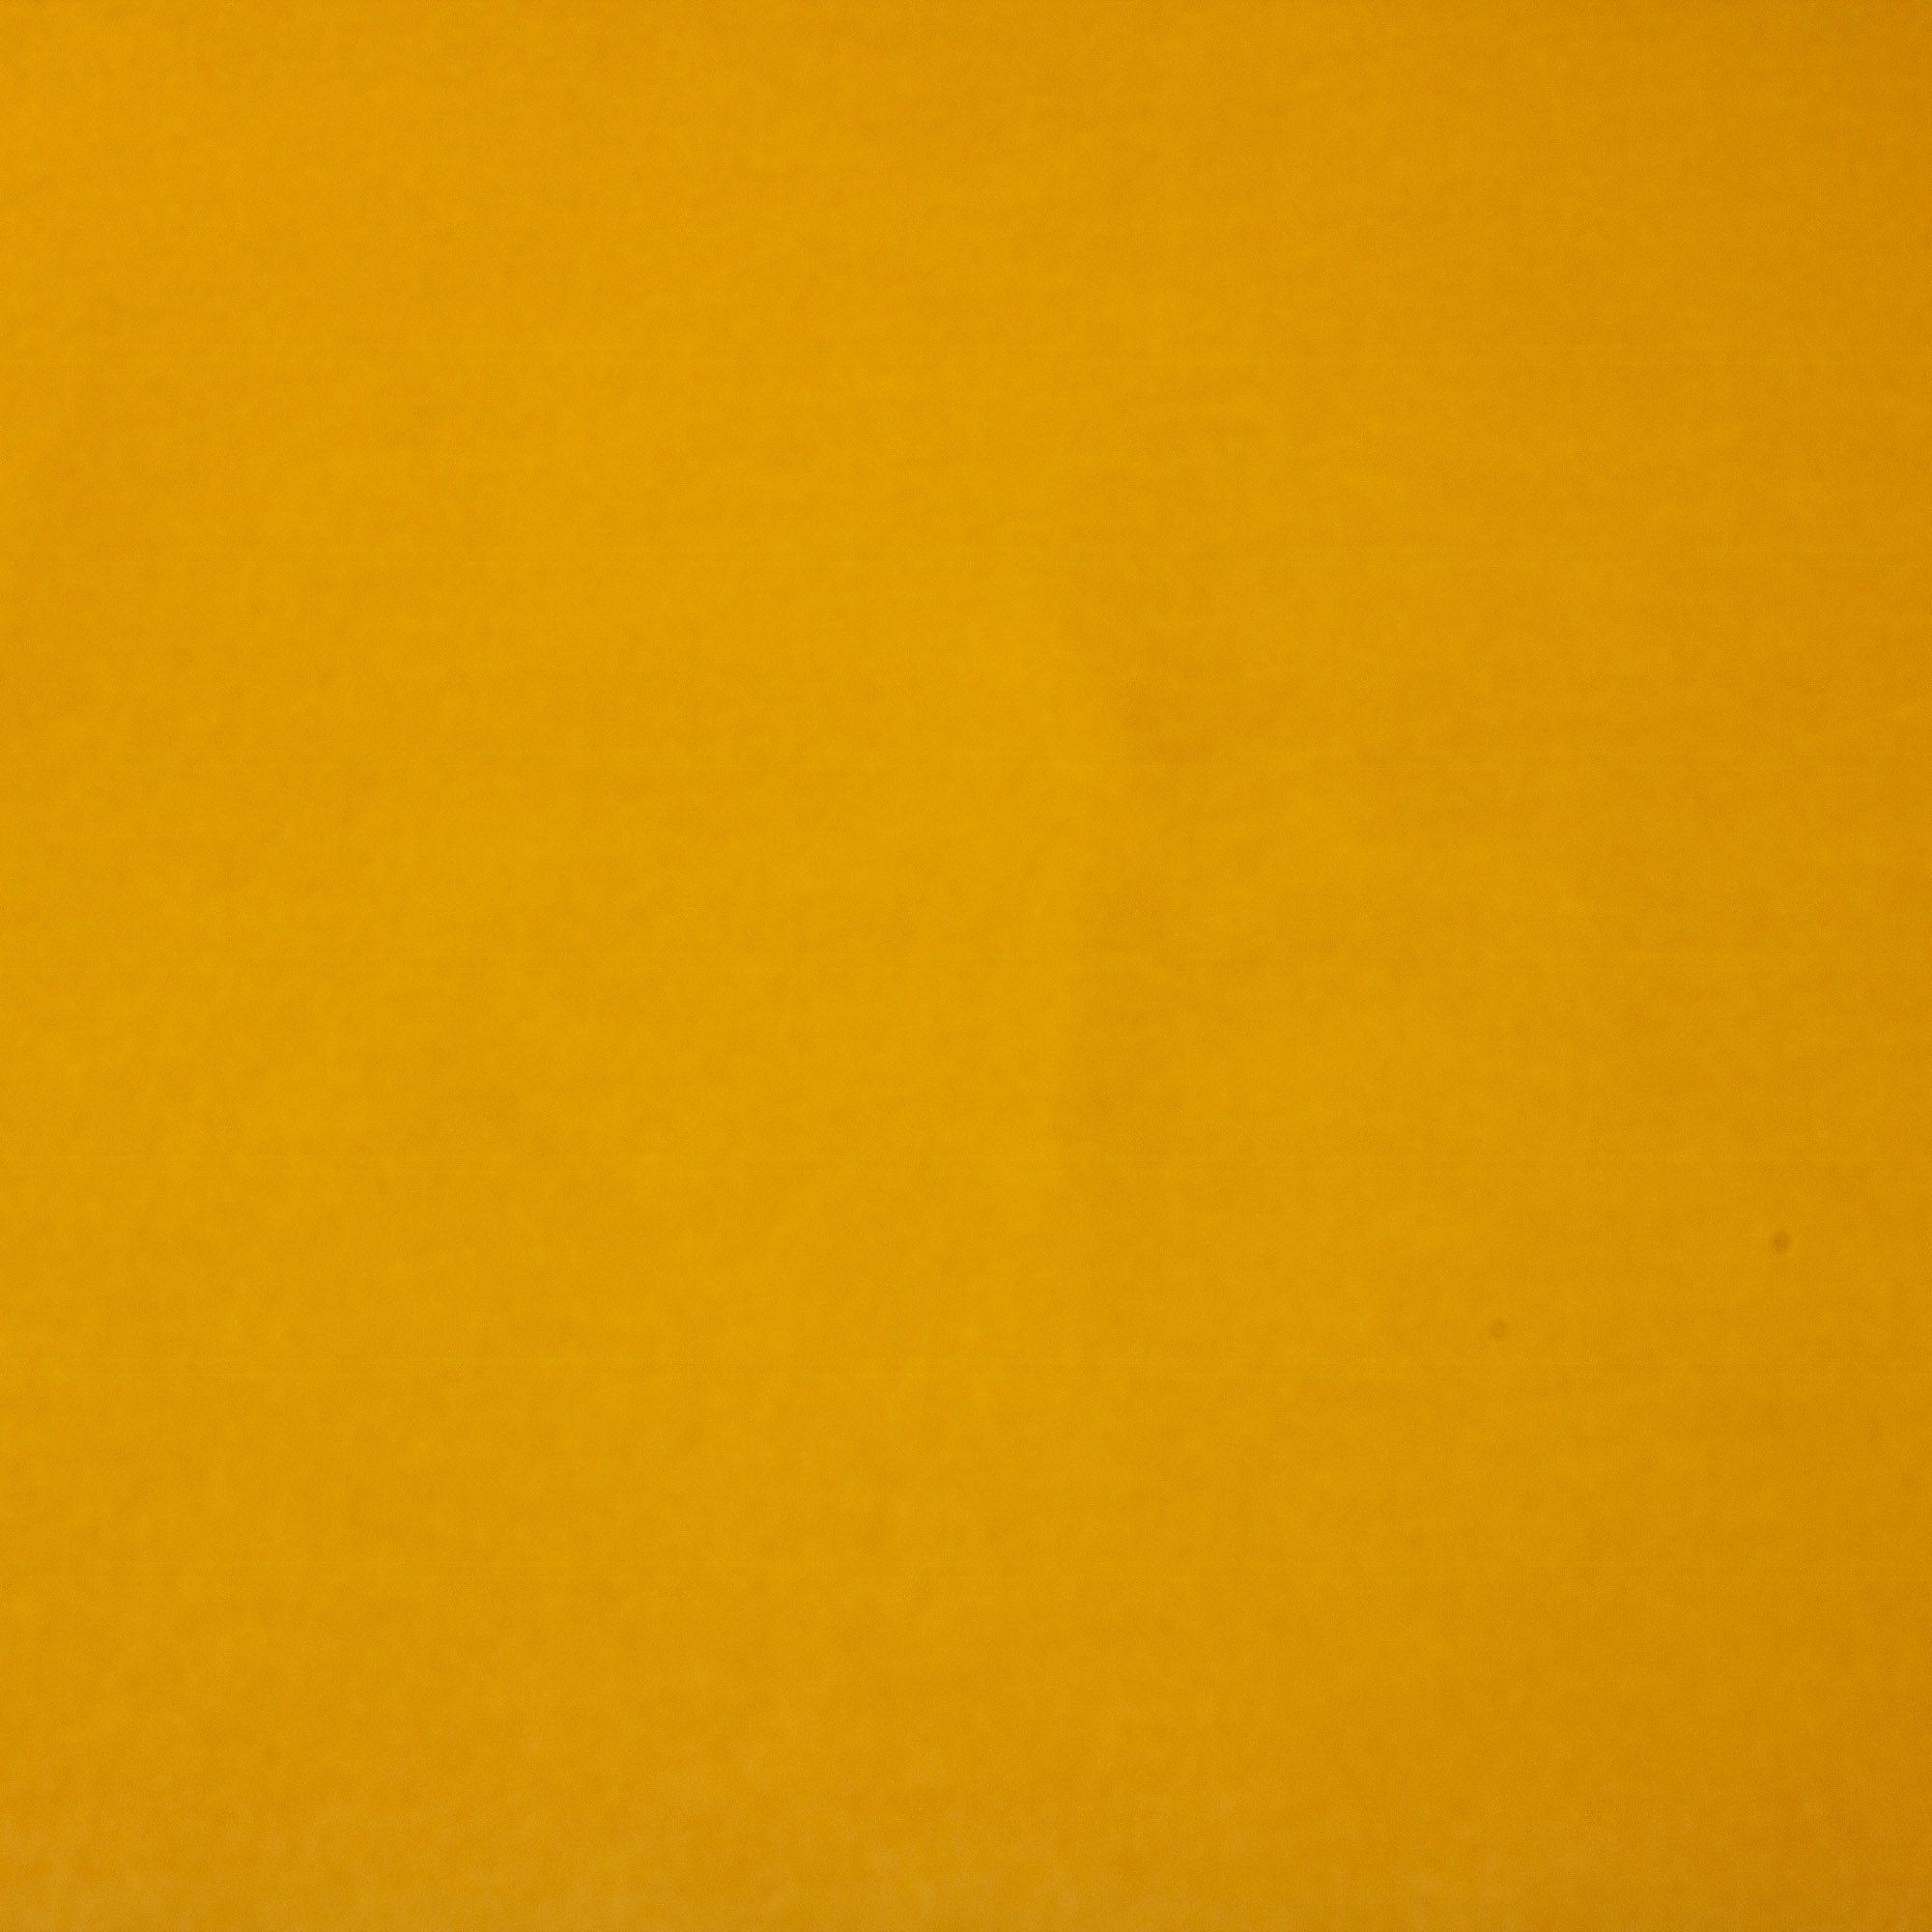 Tecido Malha Helanca Light Mostarda 100% Poliester 1,80 mt Largura